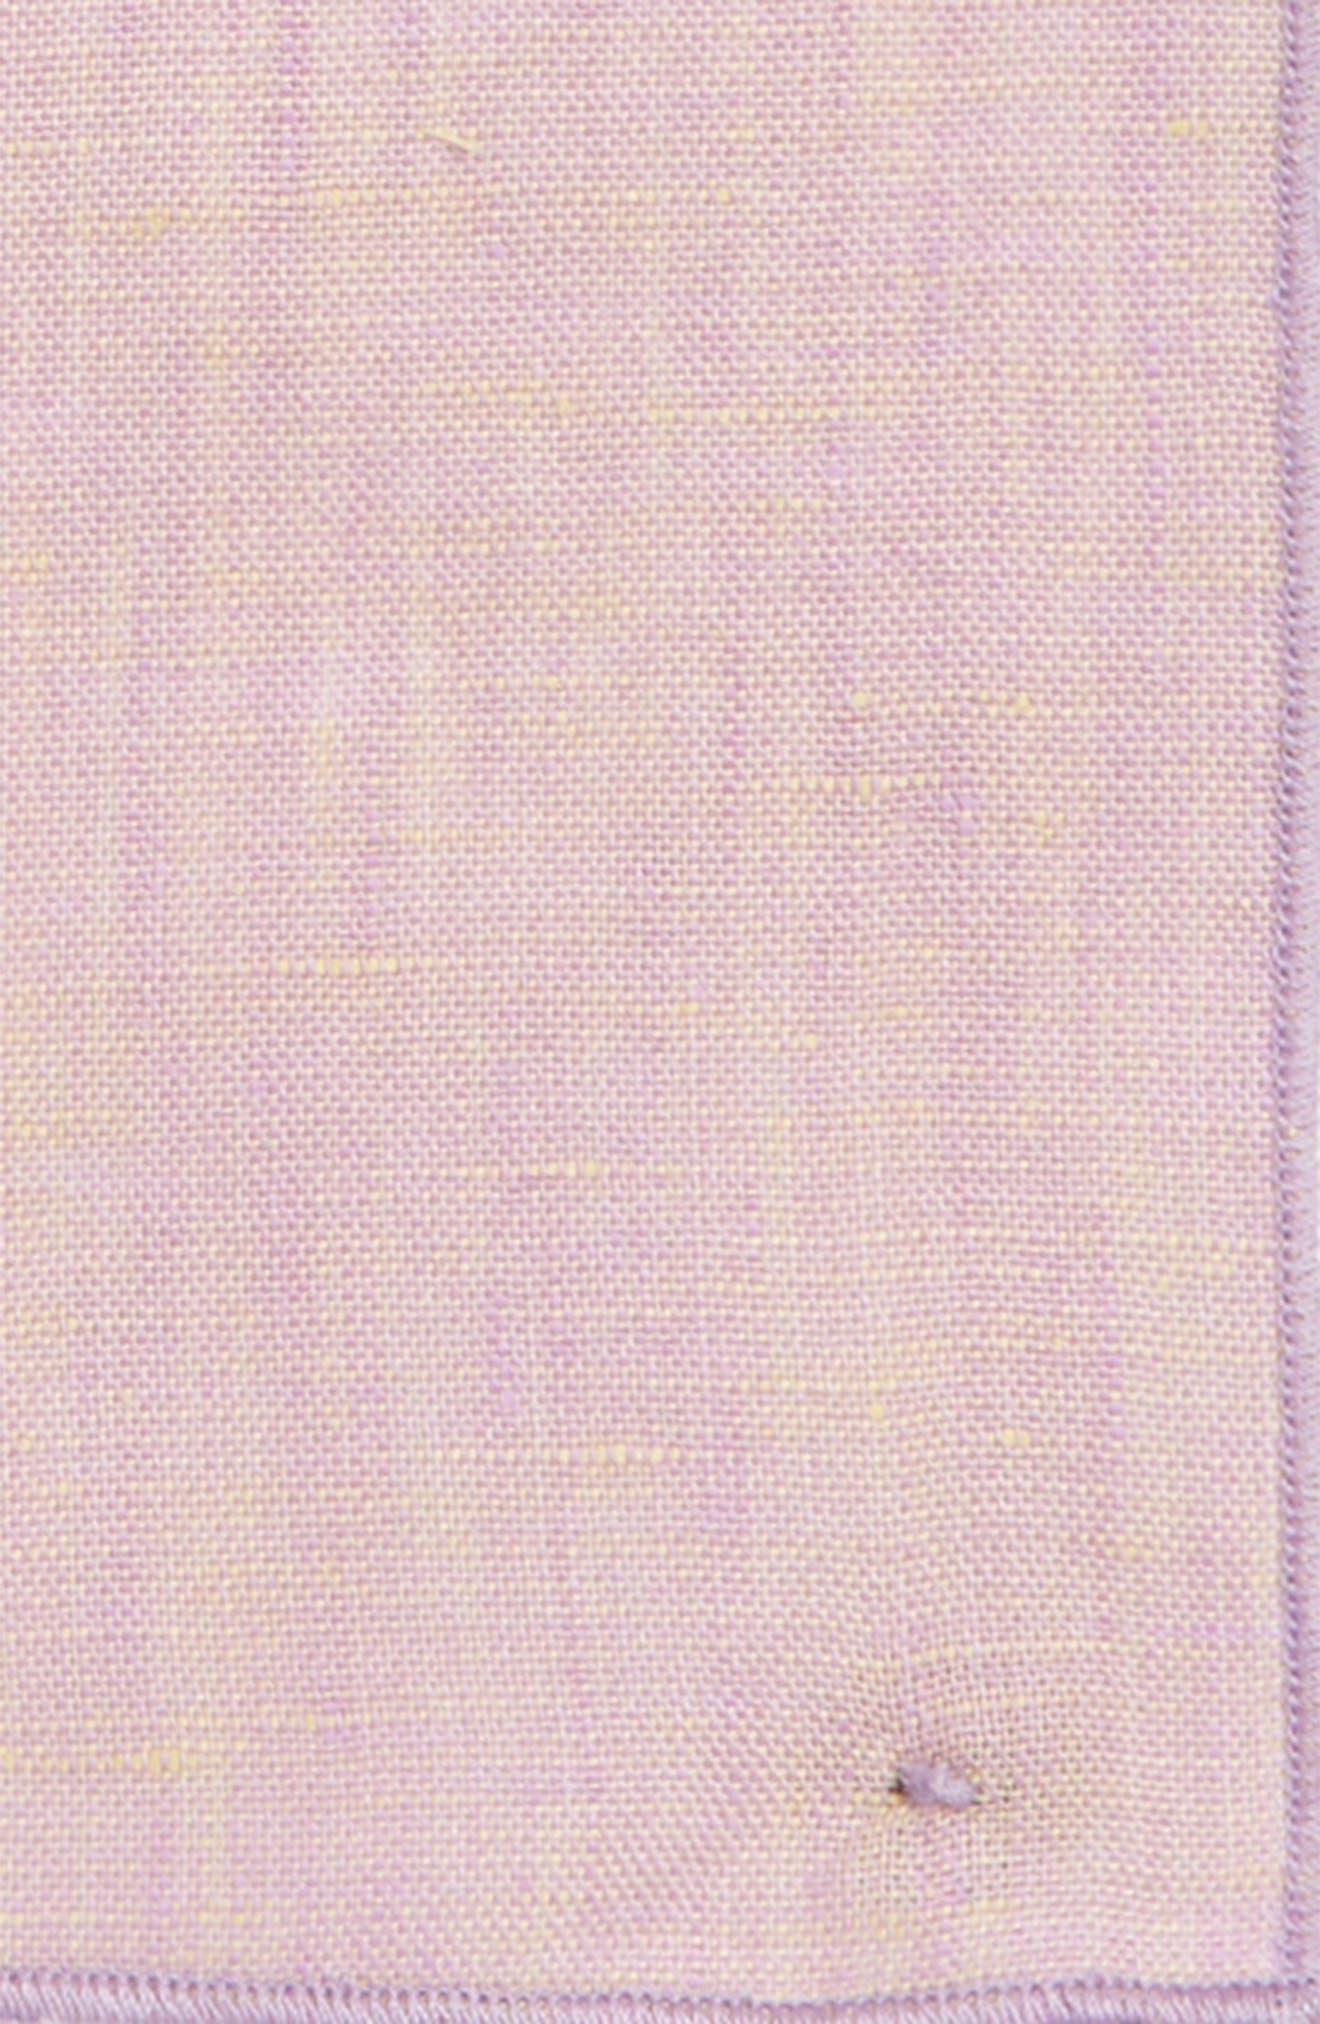 Iridescent Glass Linen Pocket Square,                             Alternate thumbnail 6, color,